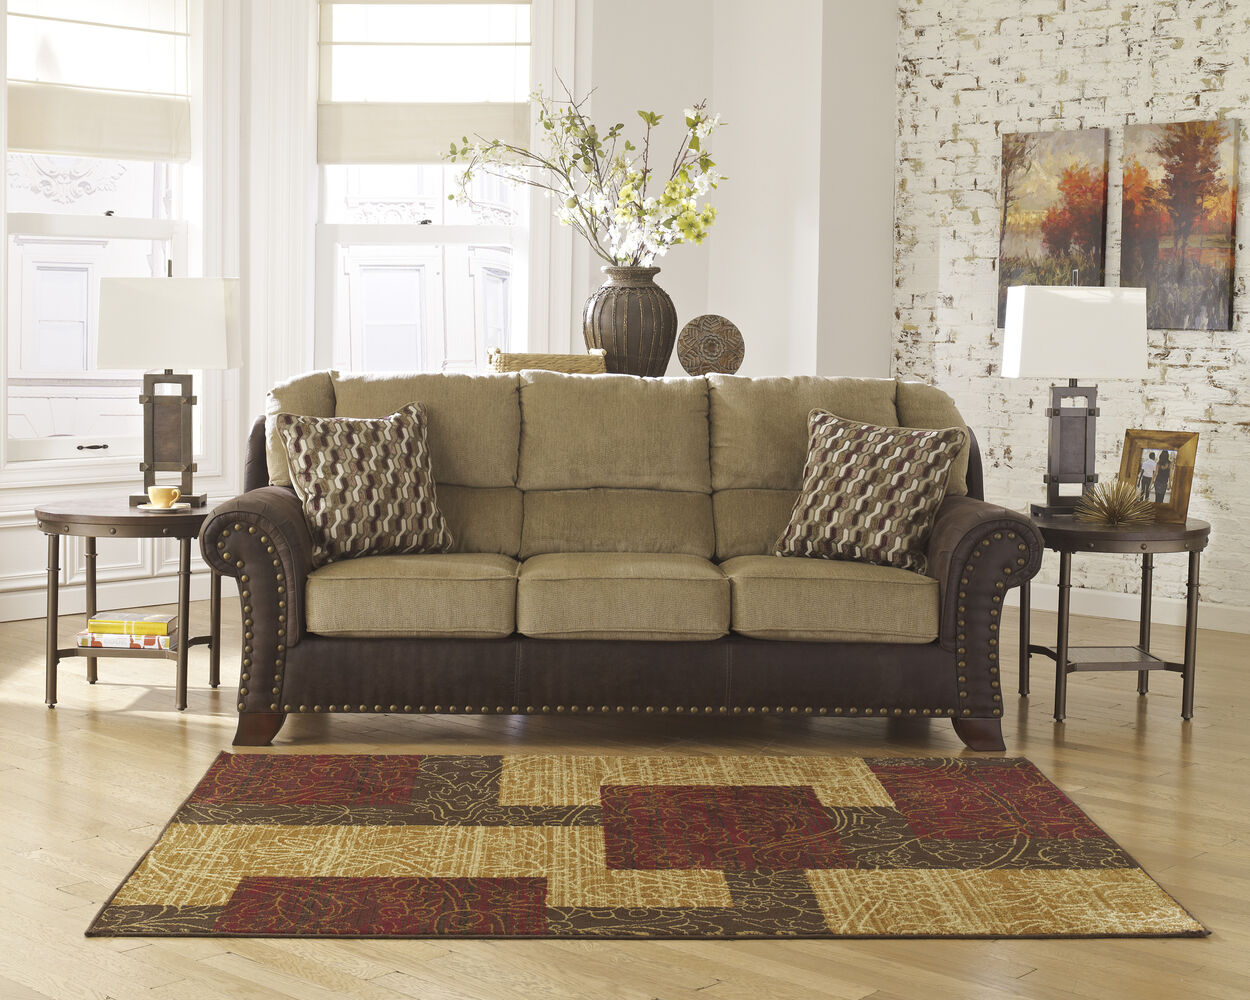 Ashley vandive mocha sofa mathis brothers furniture for Mathis brothers living room furniture